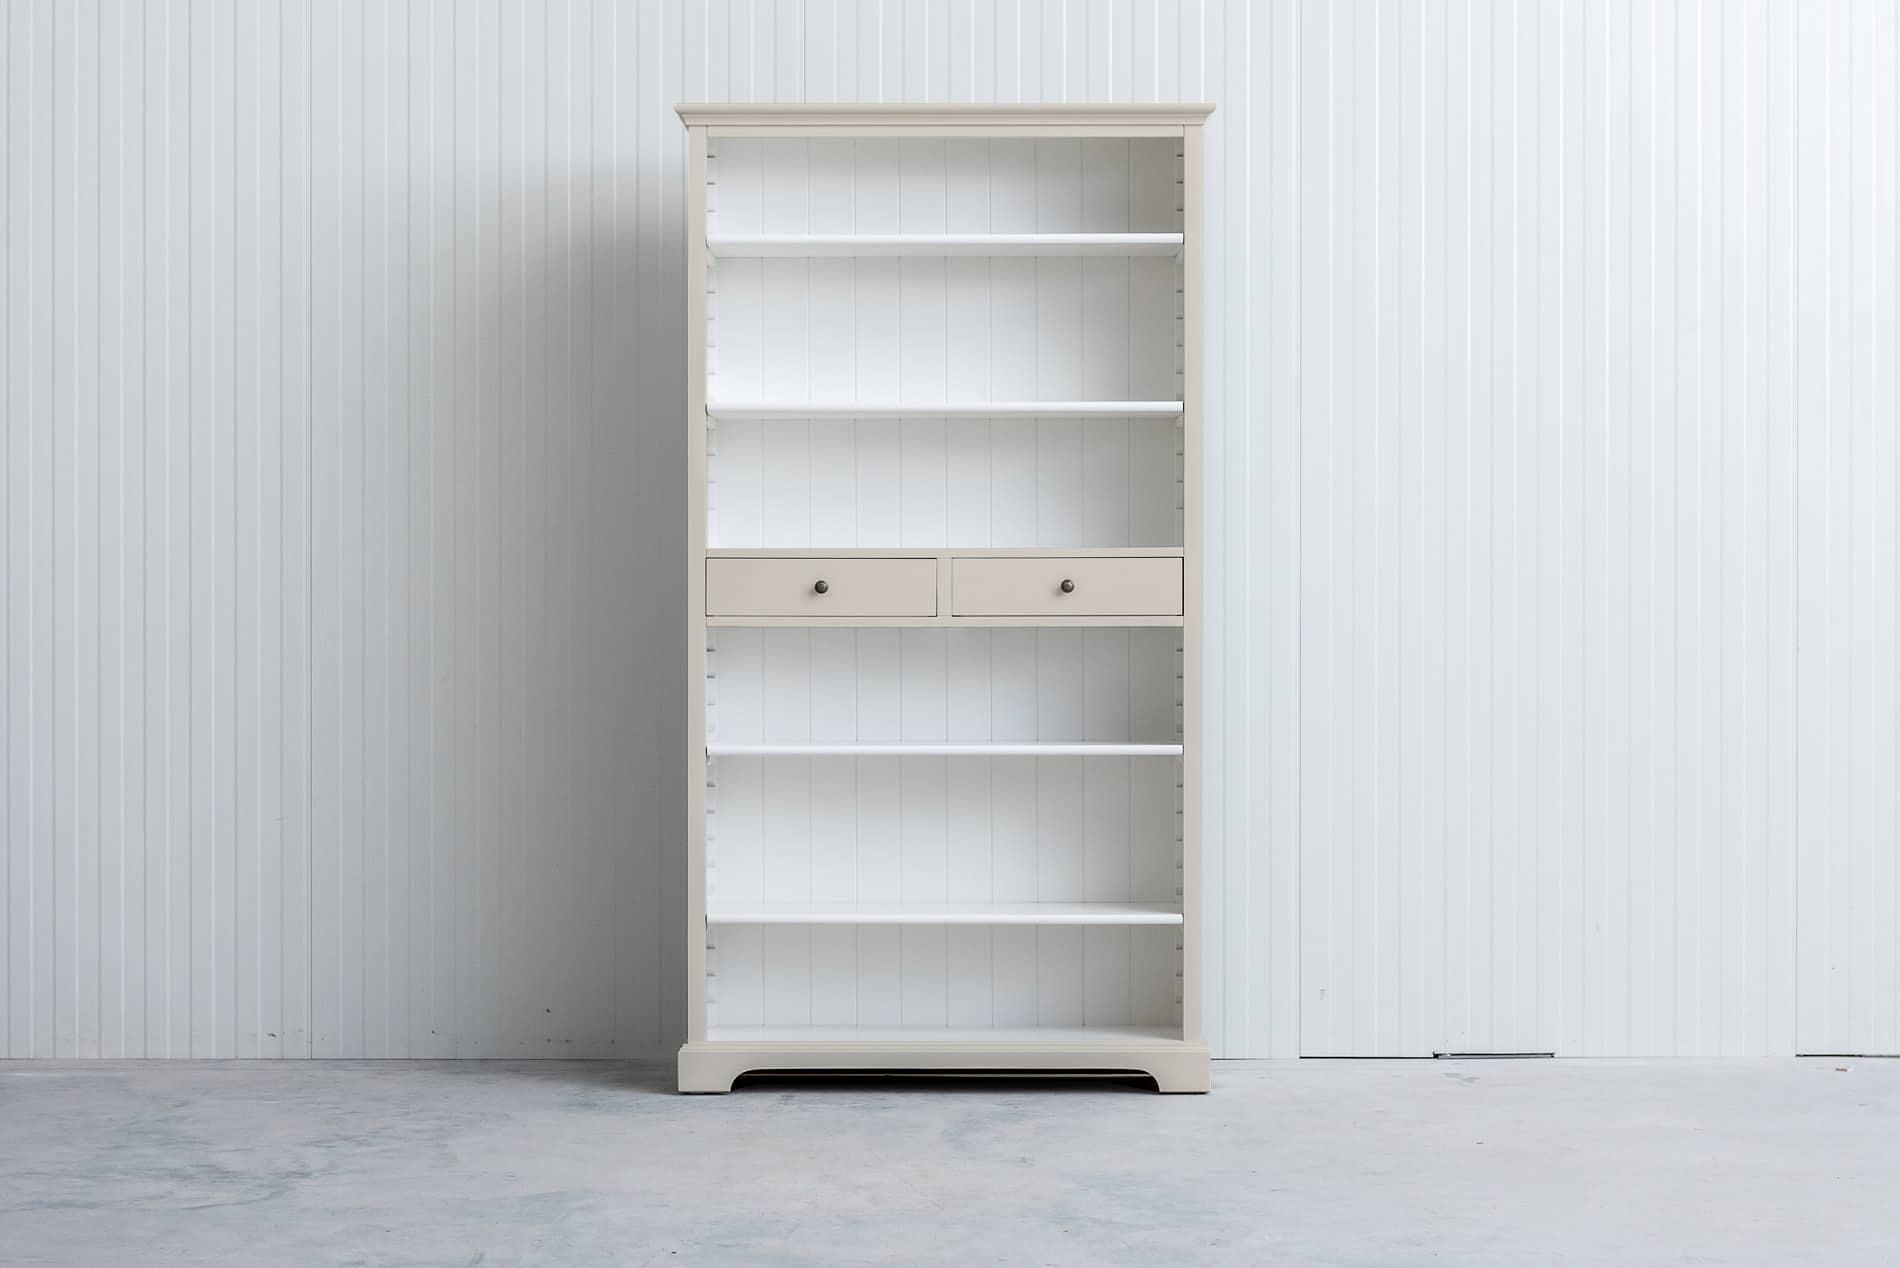 Landelijke boekenkast 1m – Crèmewit – RAL9001